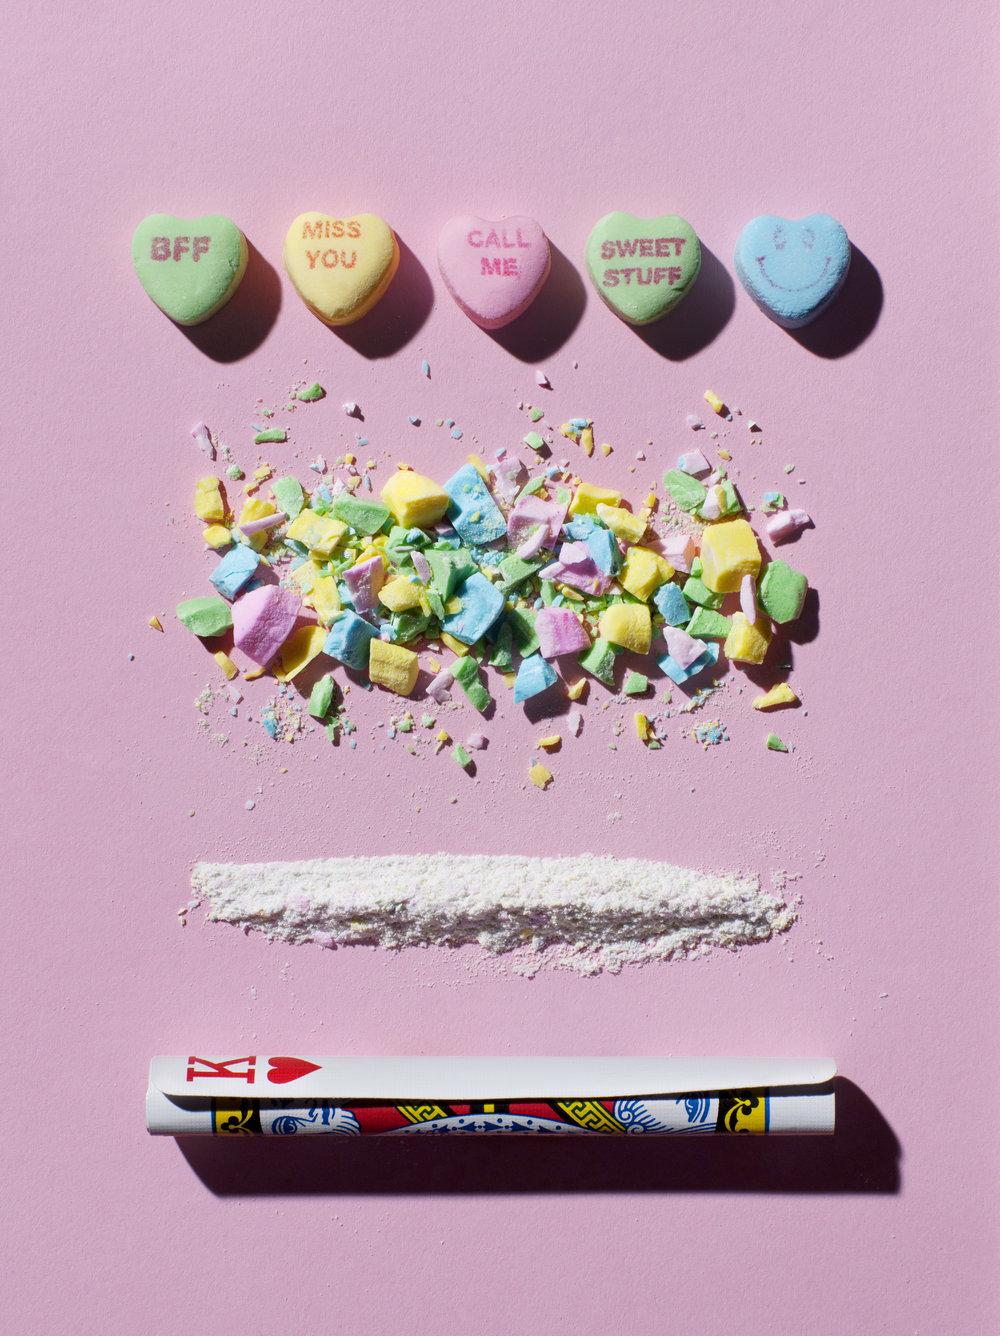 160213_Valentines_CocaineHearts_029_B_center.JPG